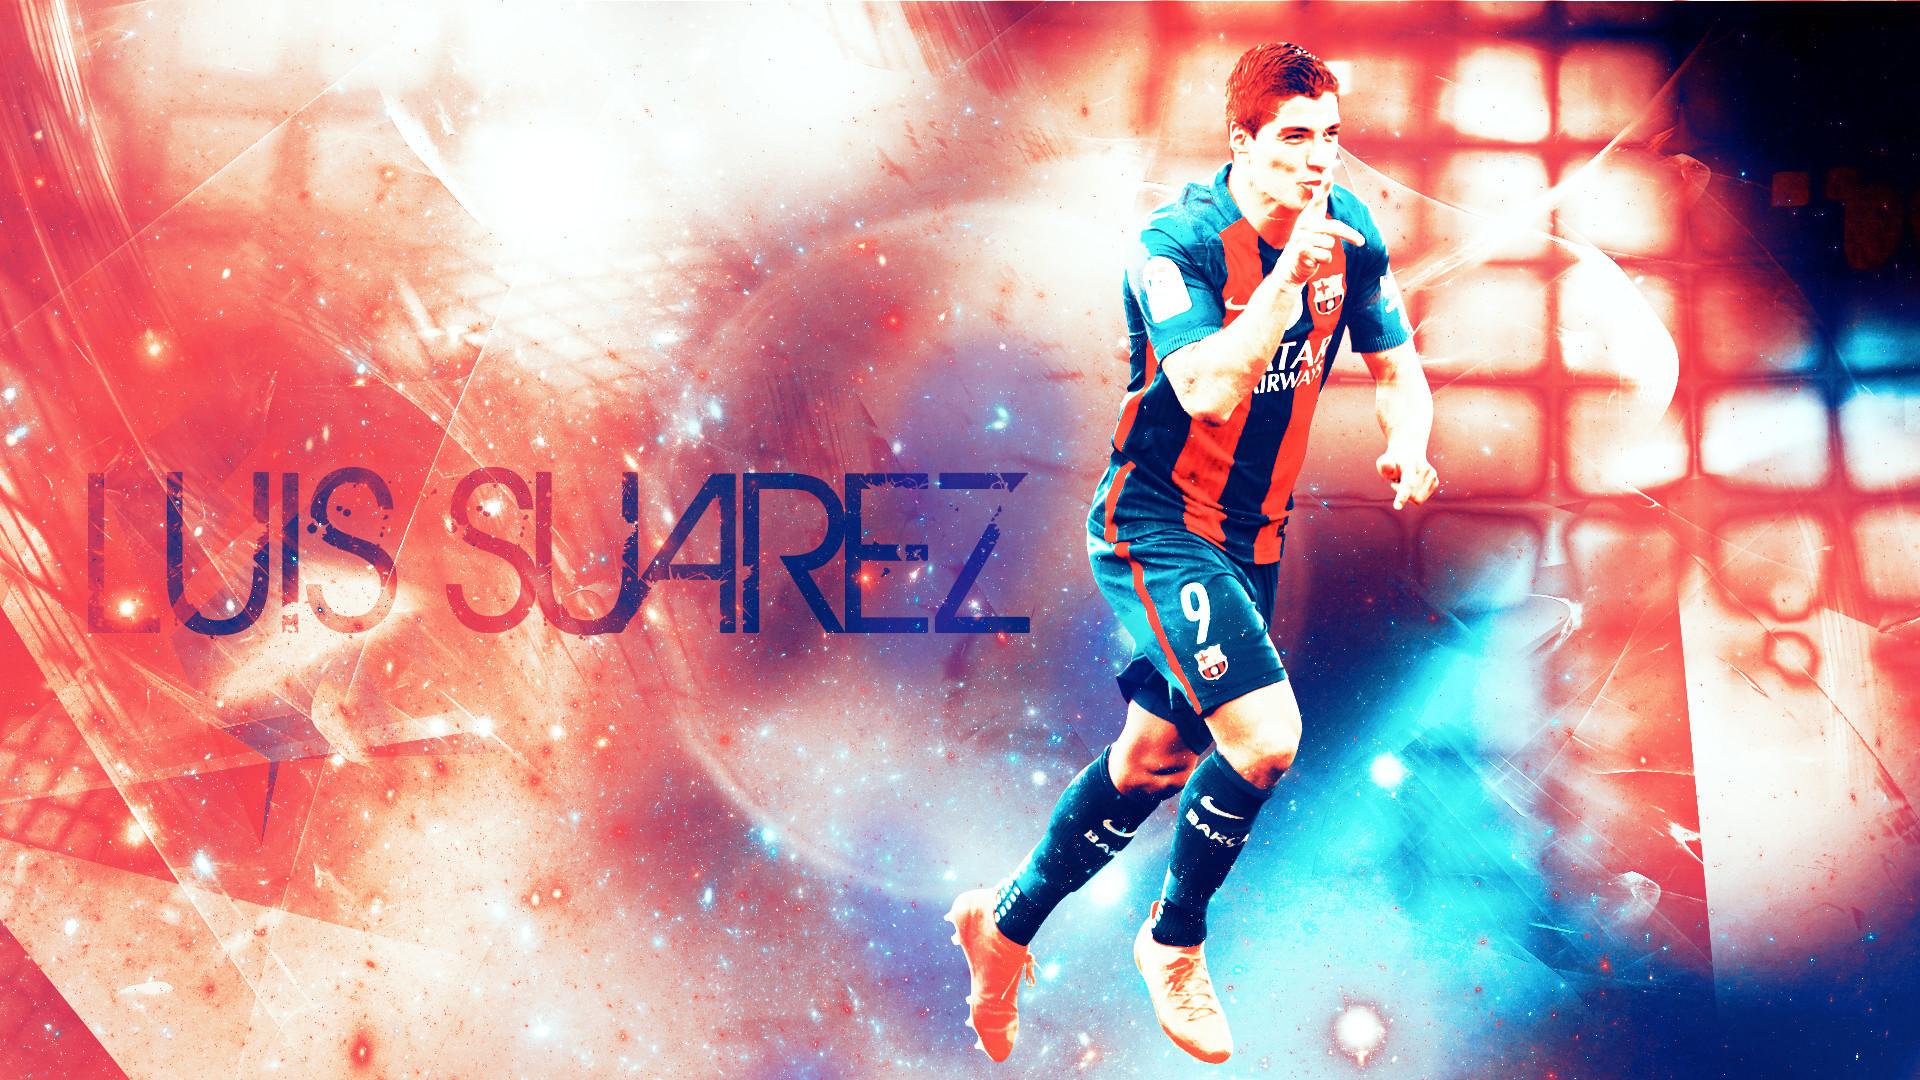 Luis Suarez Barcelona Wallpaper by LuisSuarezFan9 Luis Suarez Barcelona  Wallpaper by LuisSuarezFan9